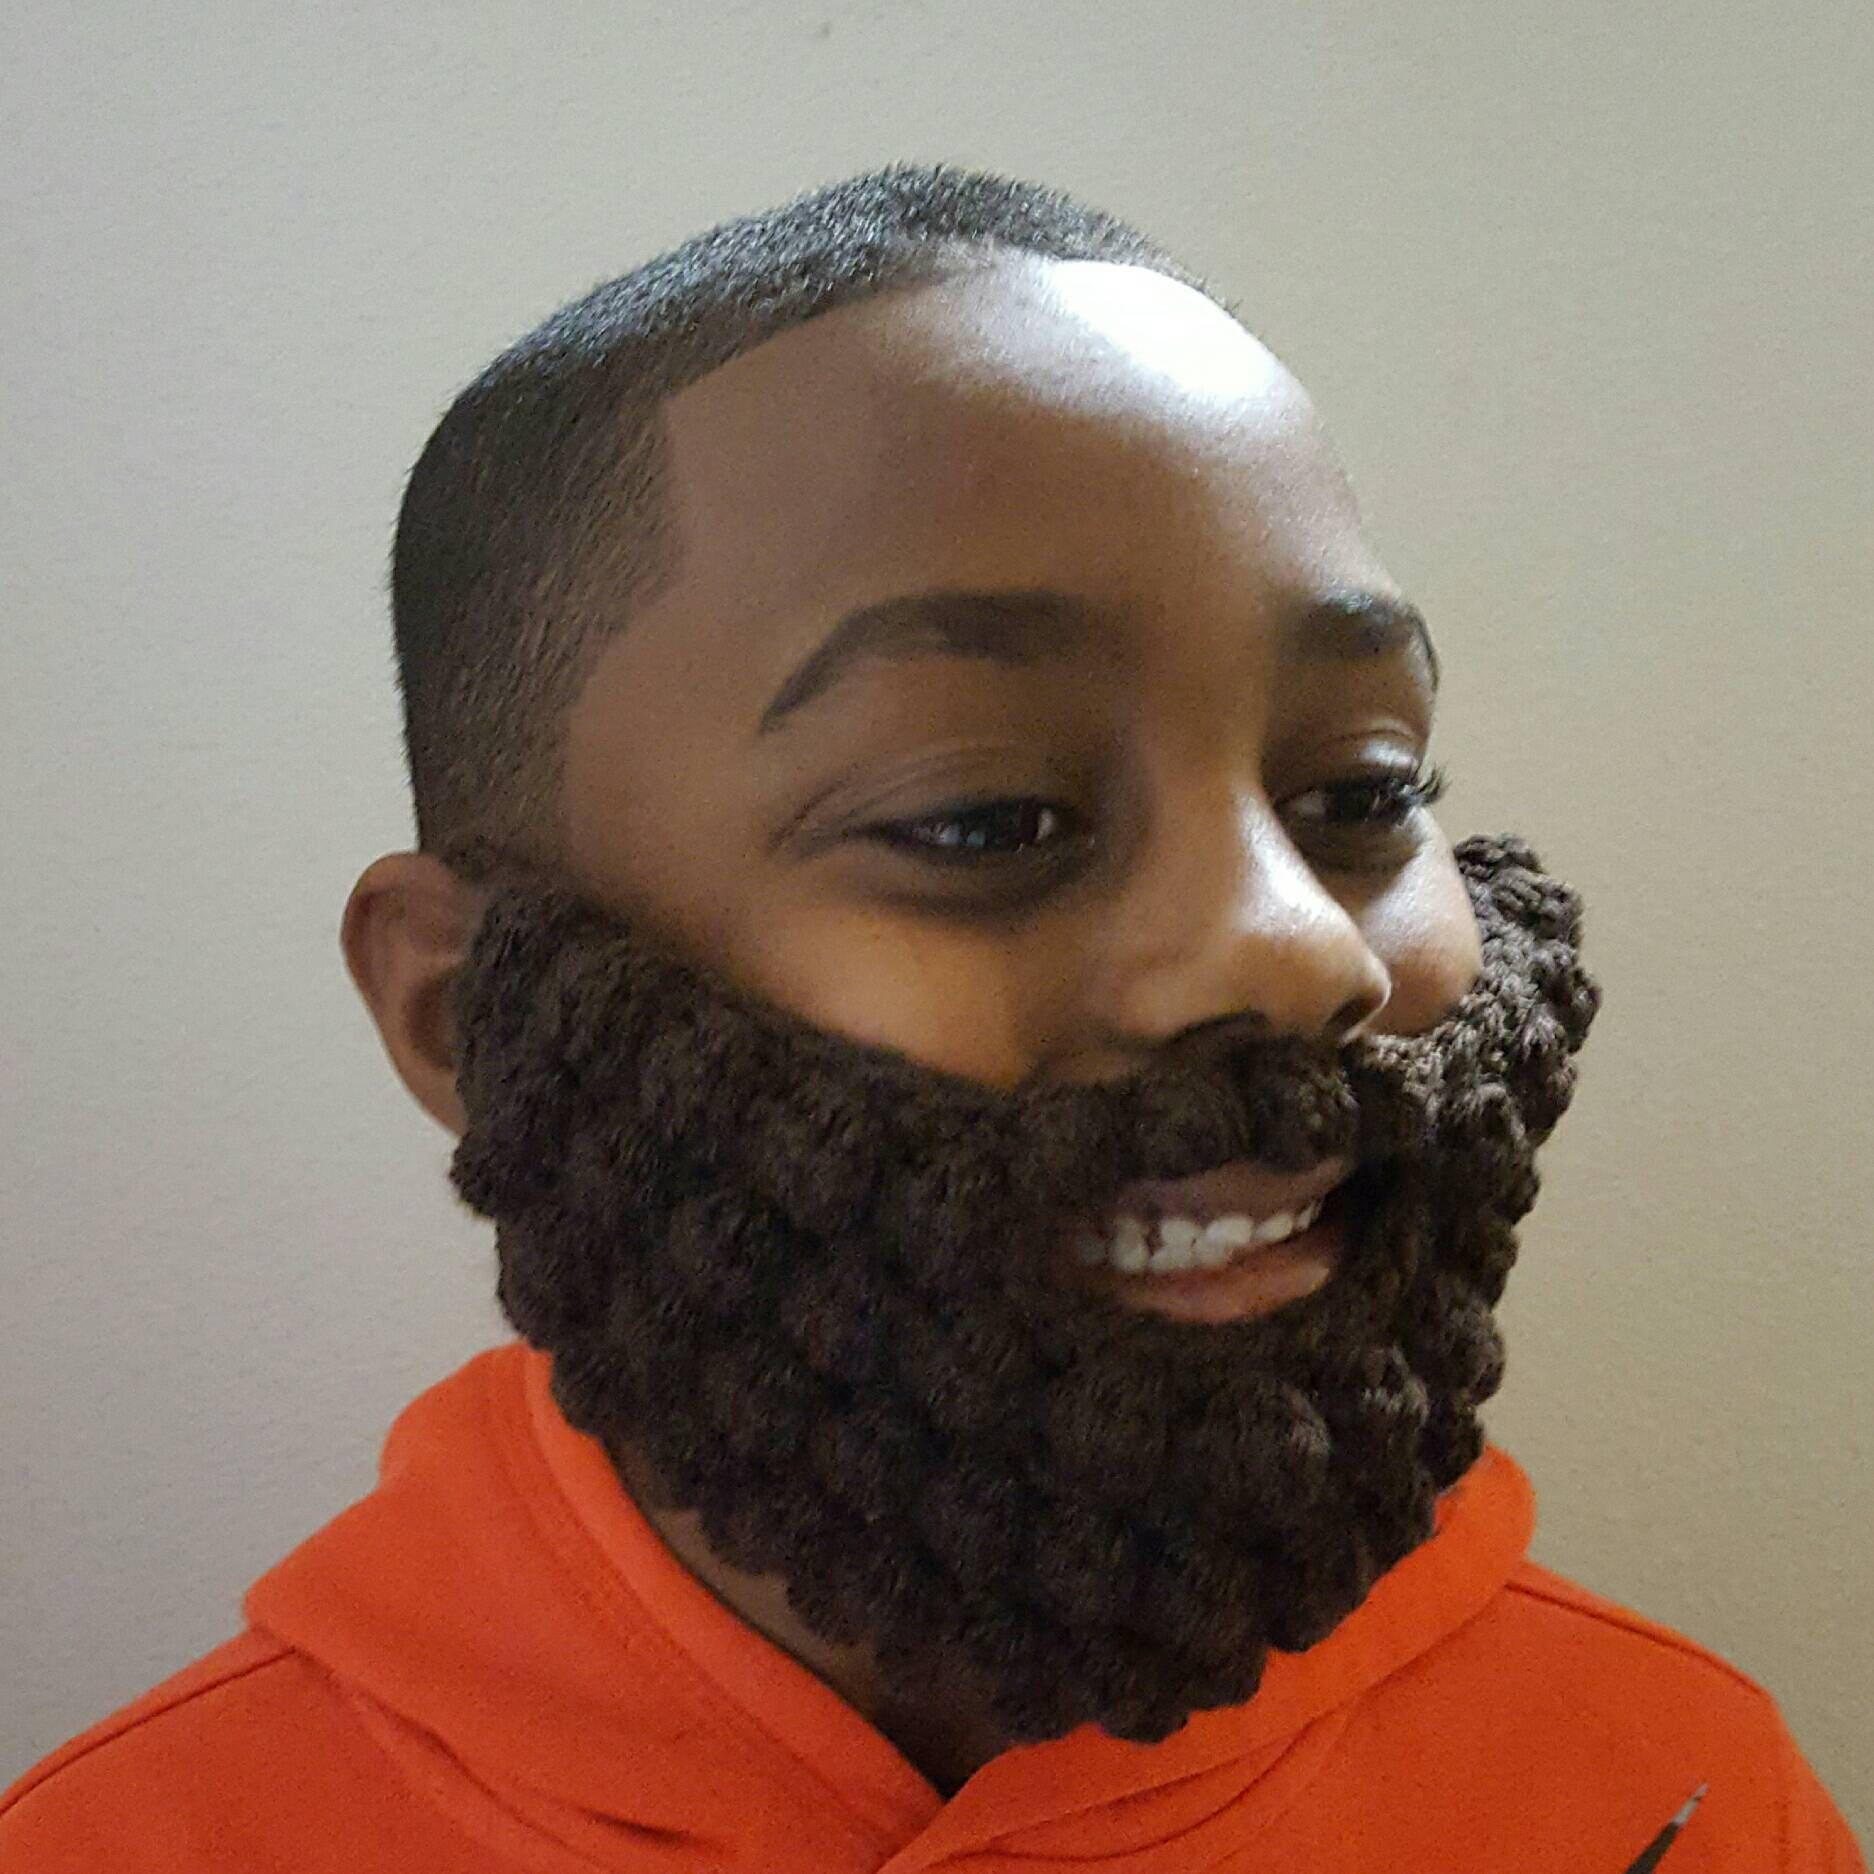 Crochet beard fake beard kids beard yarn beard bearded  ce15929ea2b2